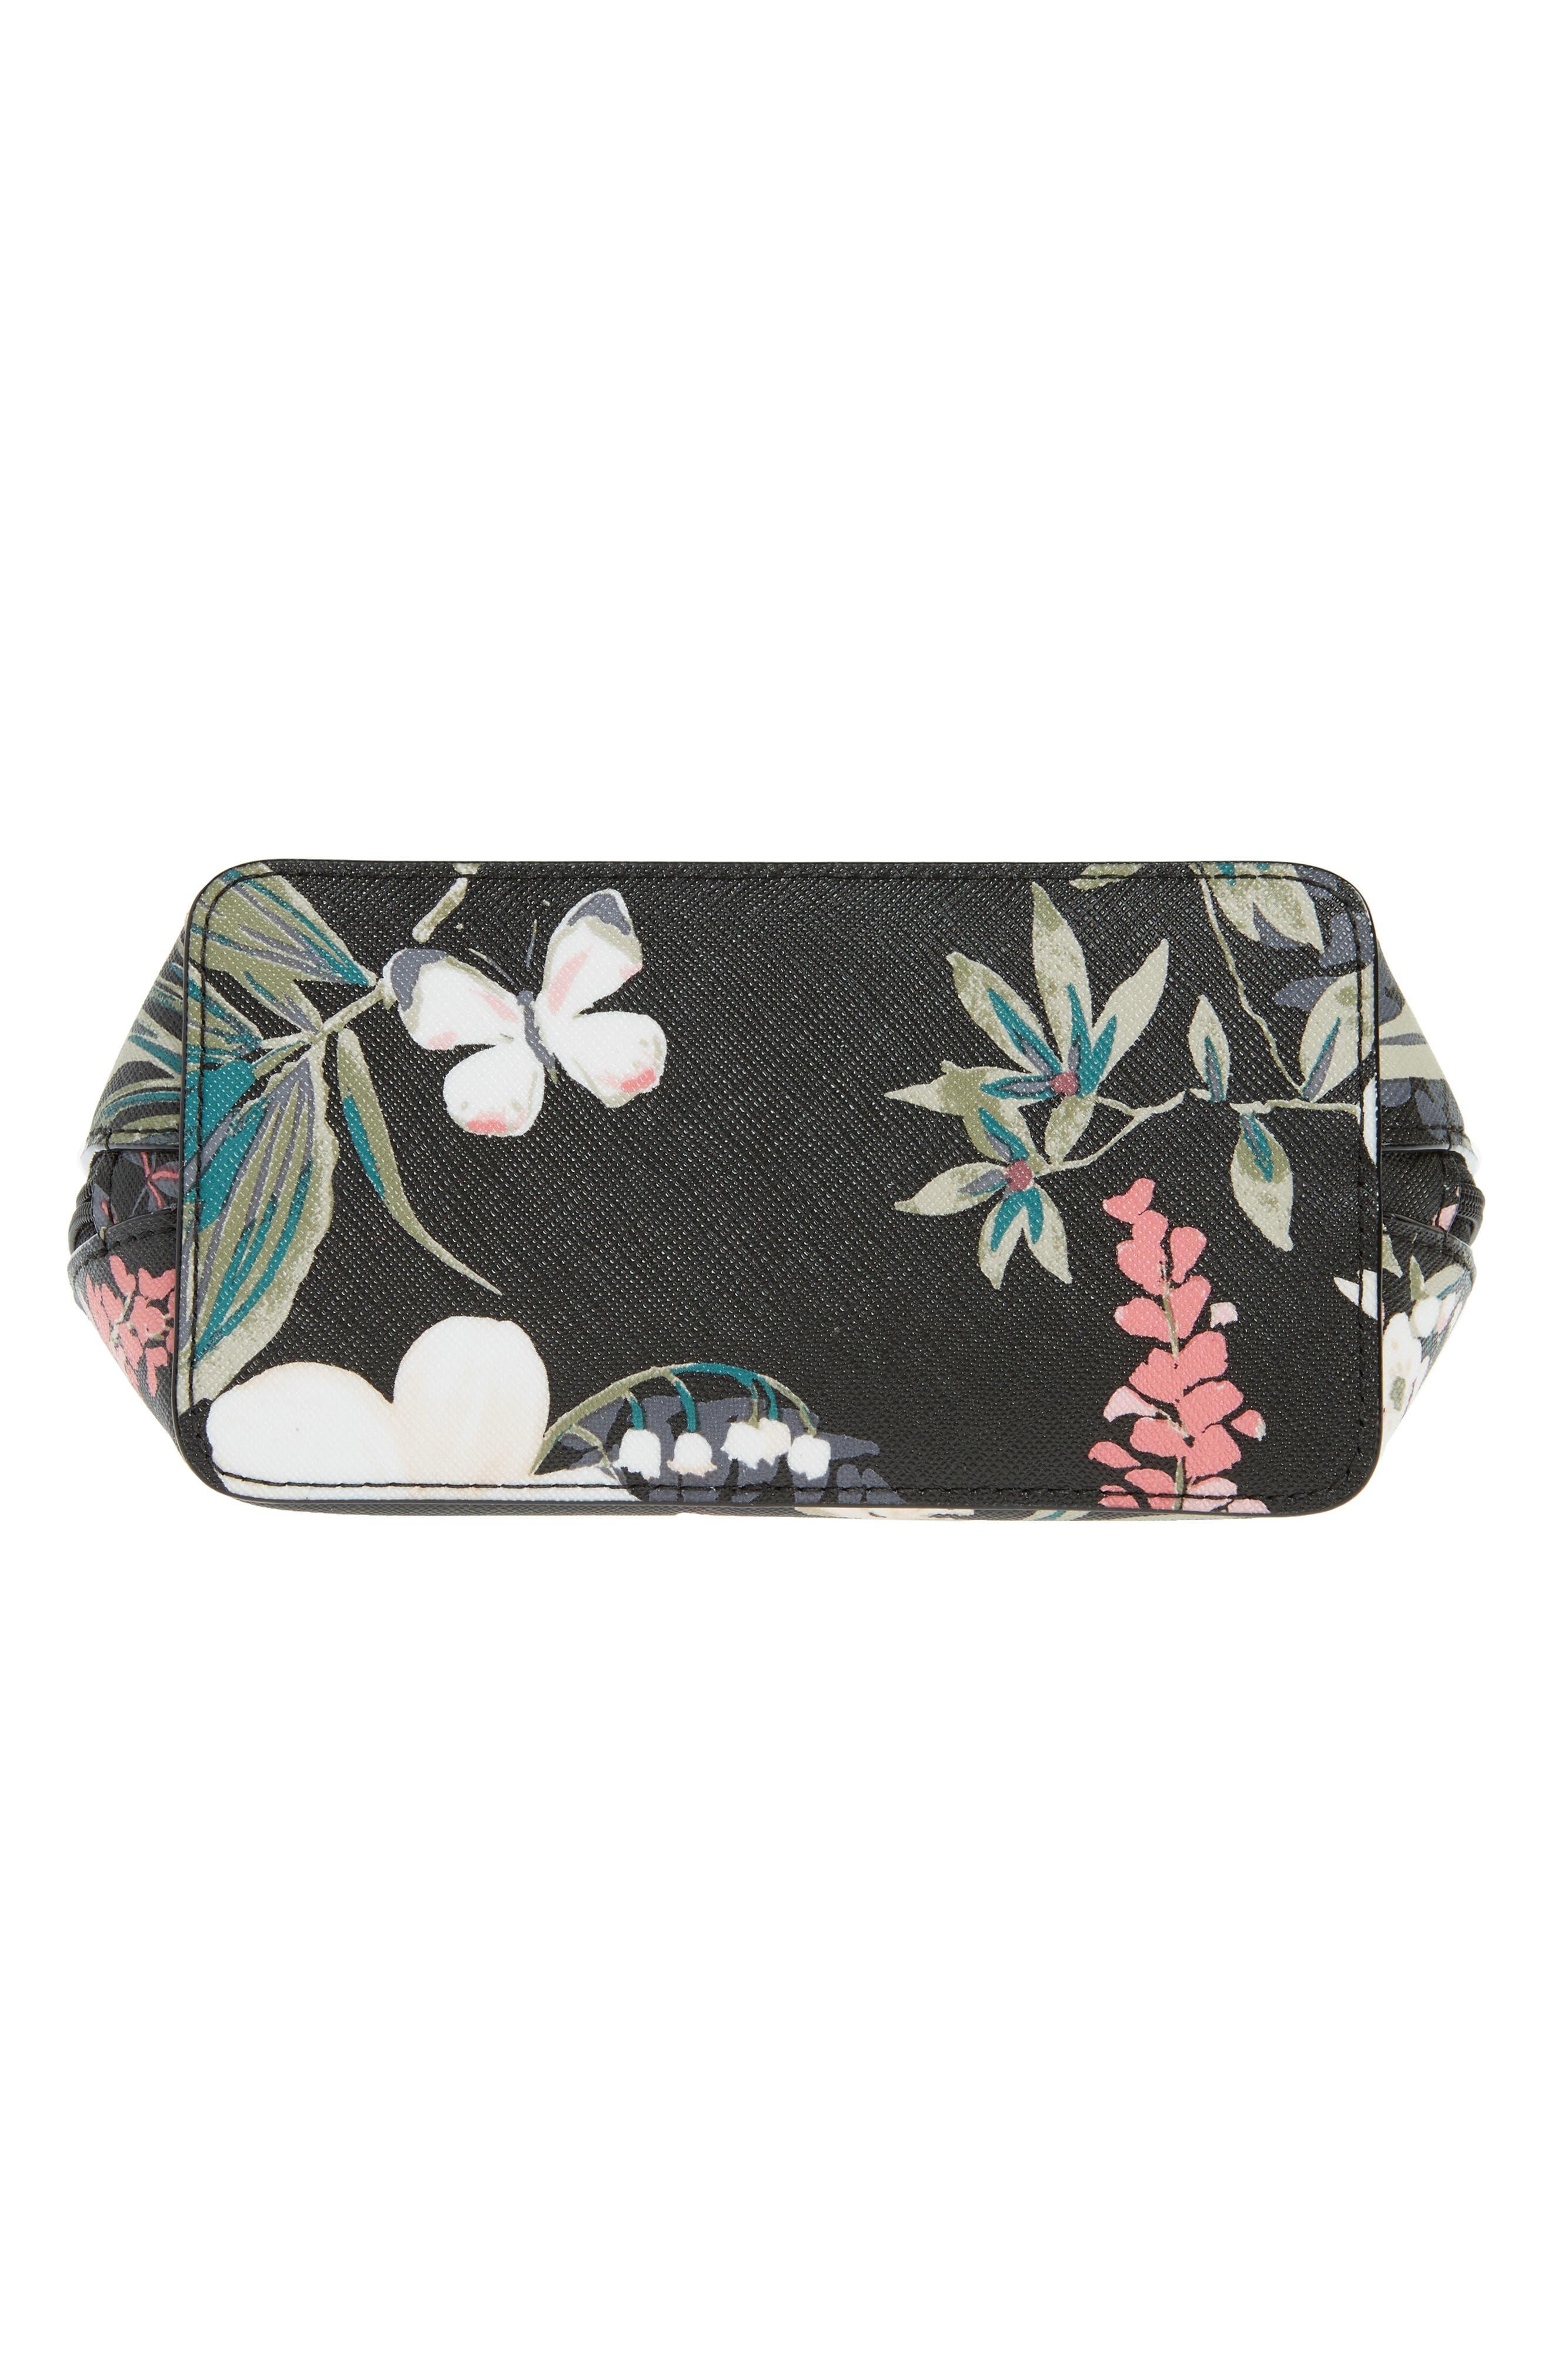 cameron street - small botanical abalene faux leather cosmetics case,                             Alternate thumbnail 5, color,                             Black Multi